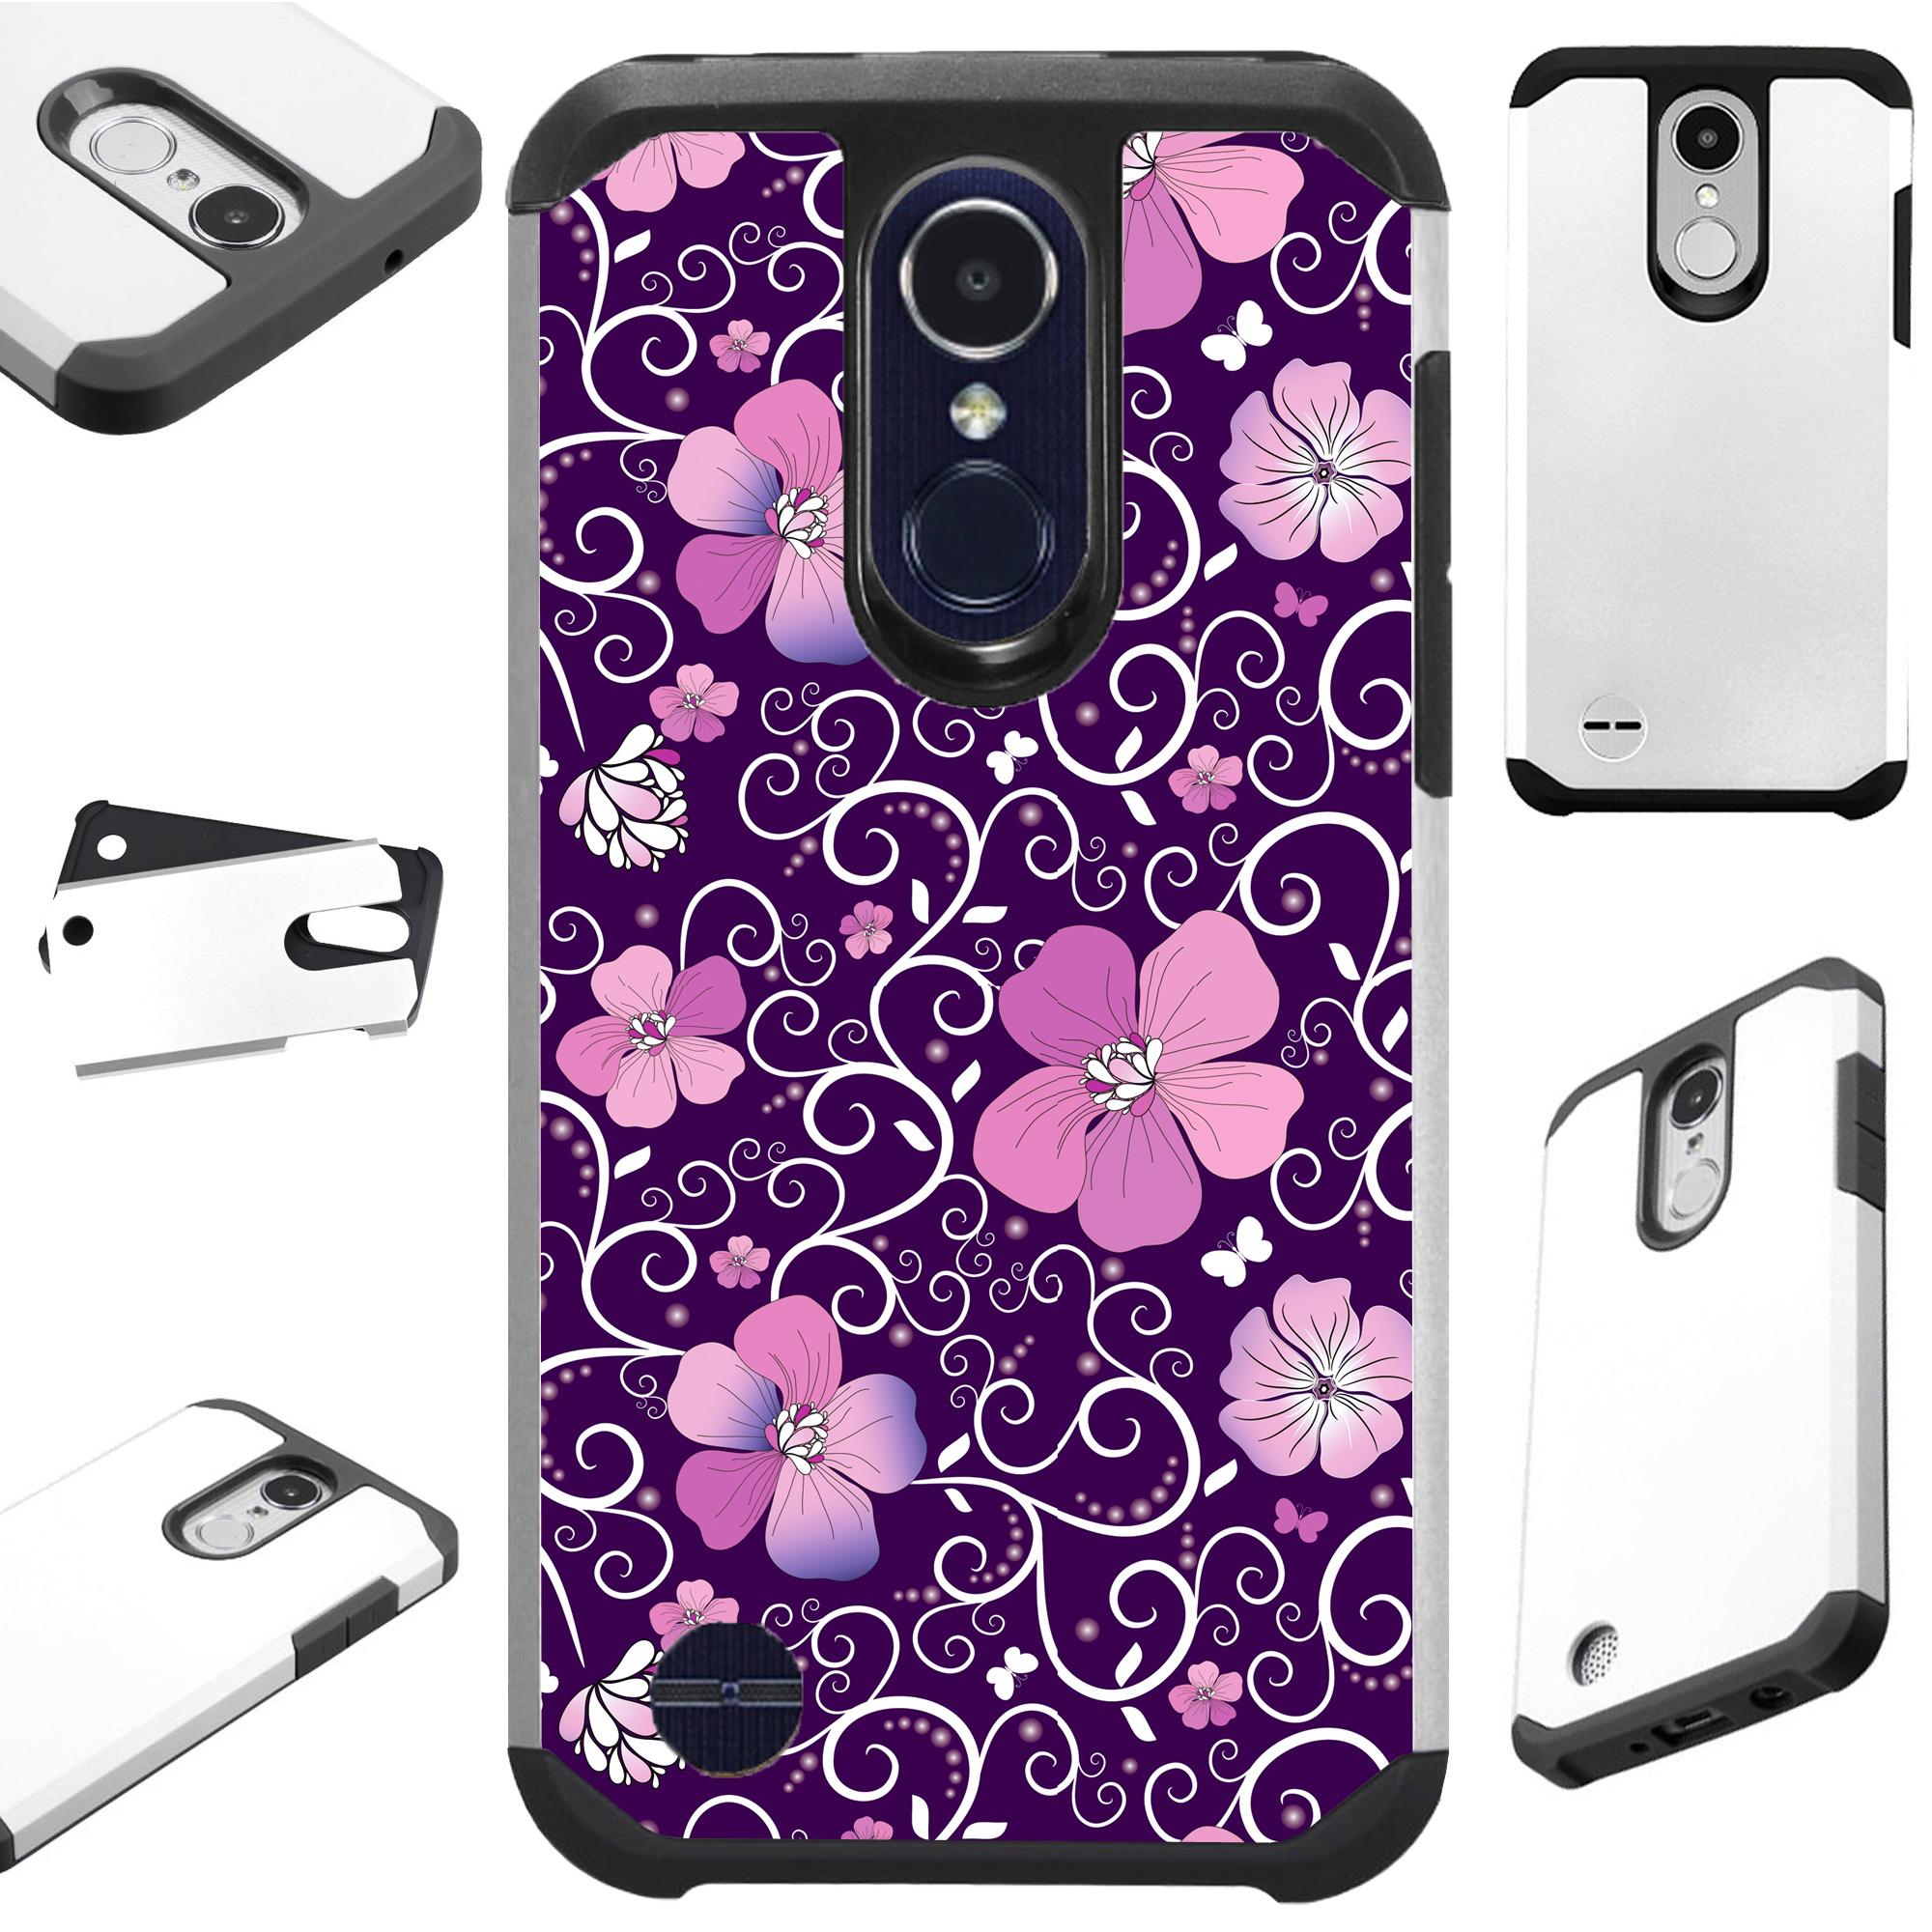 For LG Rebel 4 | LG Rebel 3 Case Hybrid TPU Fusion Phone Cover (Purple Flowe Vine)